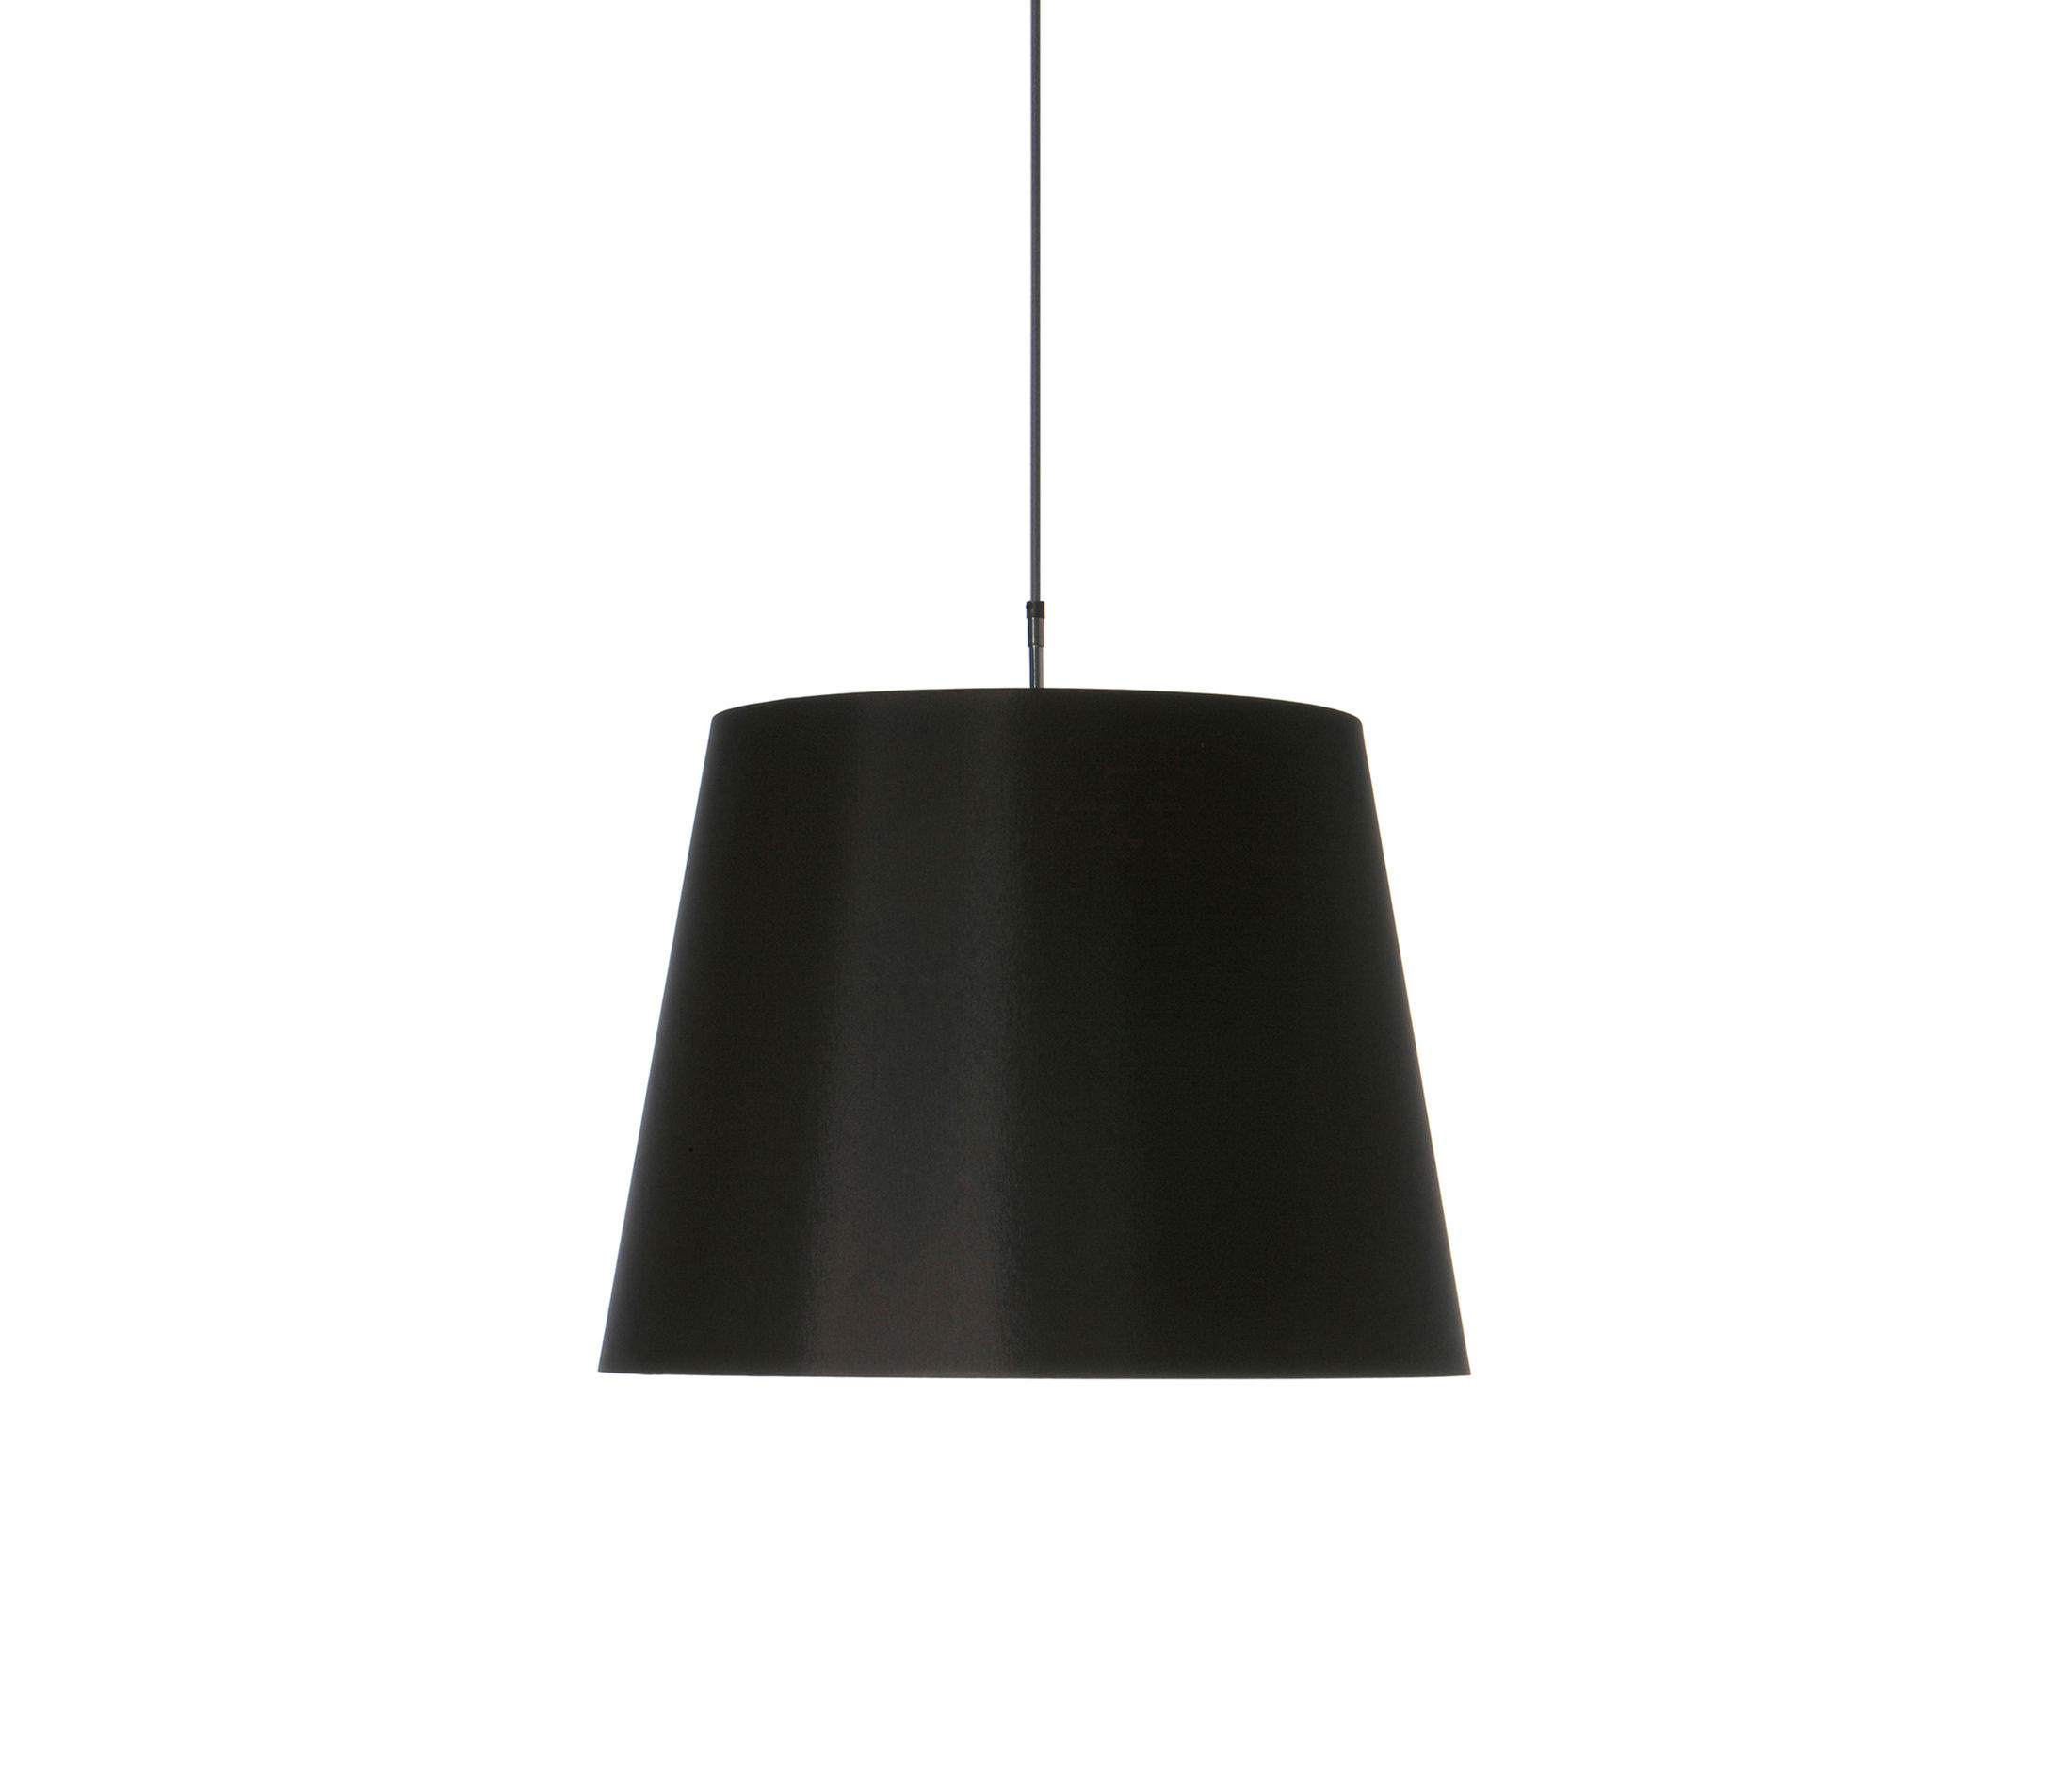 Hang pendant light general lighting from moooi architonic hang pendant light by moooi general lighting aloadofball Choice Image